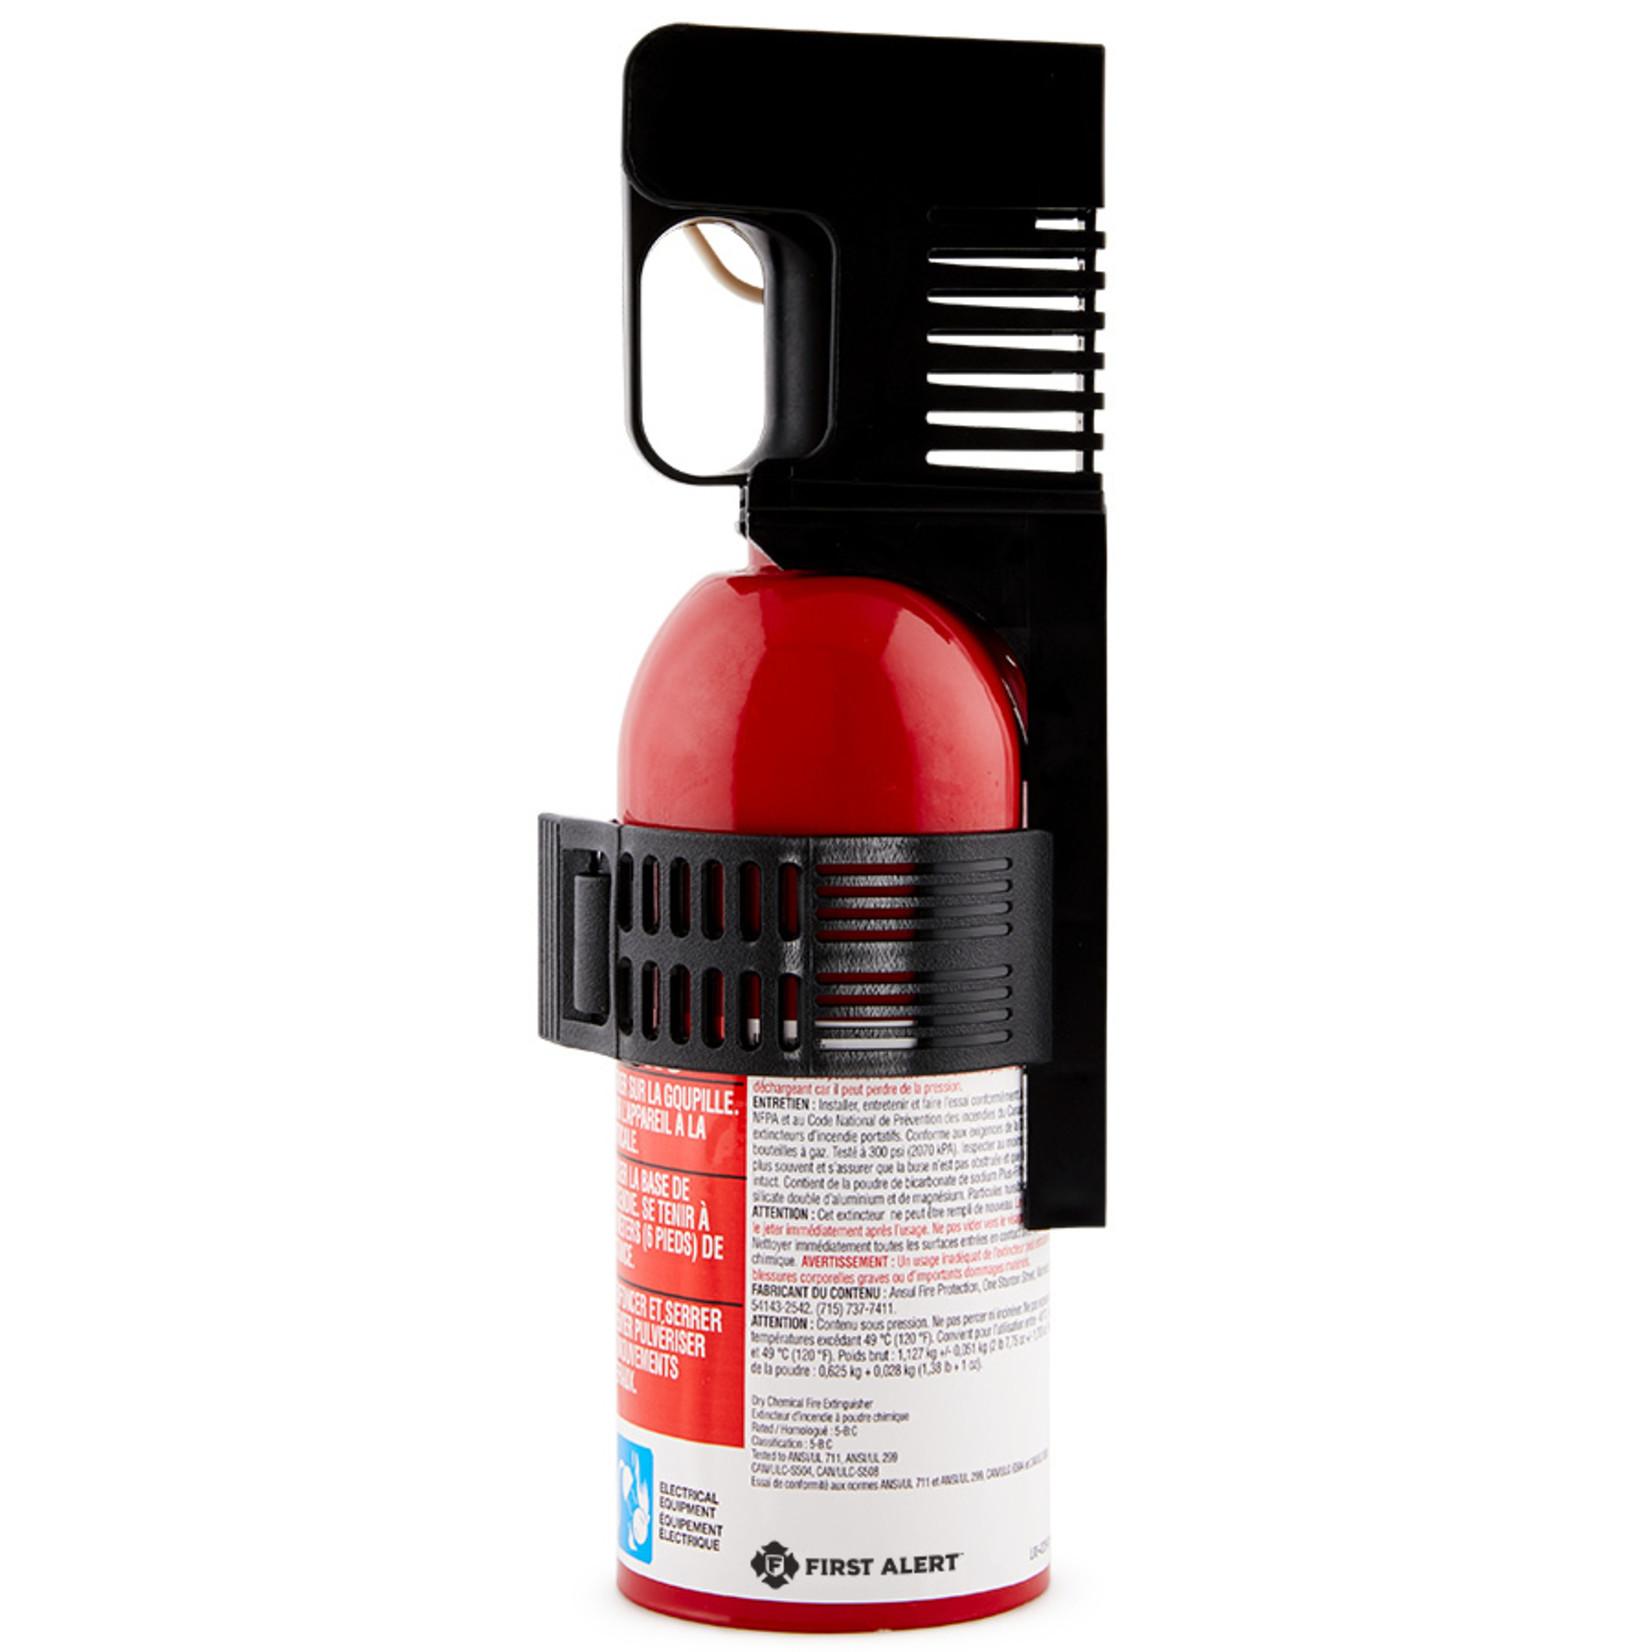 BRK AUTO 5lb Auto Fire Extinguisher